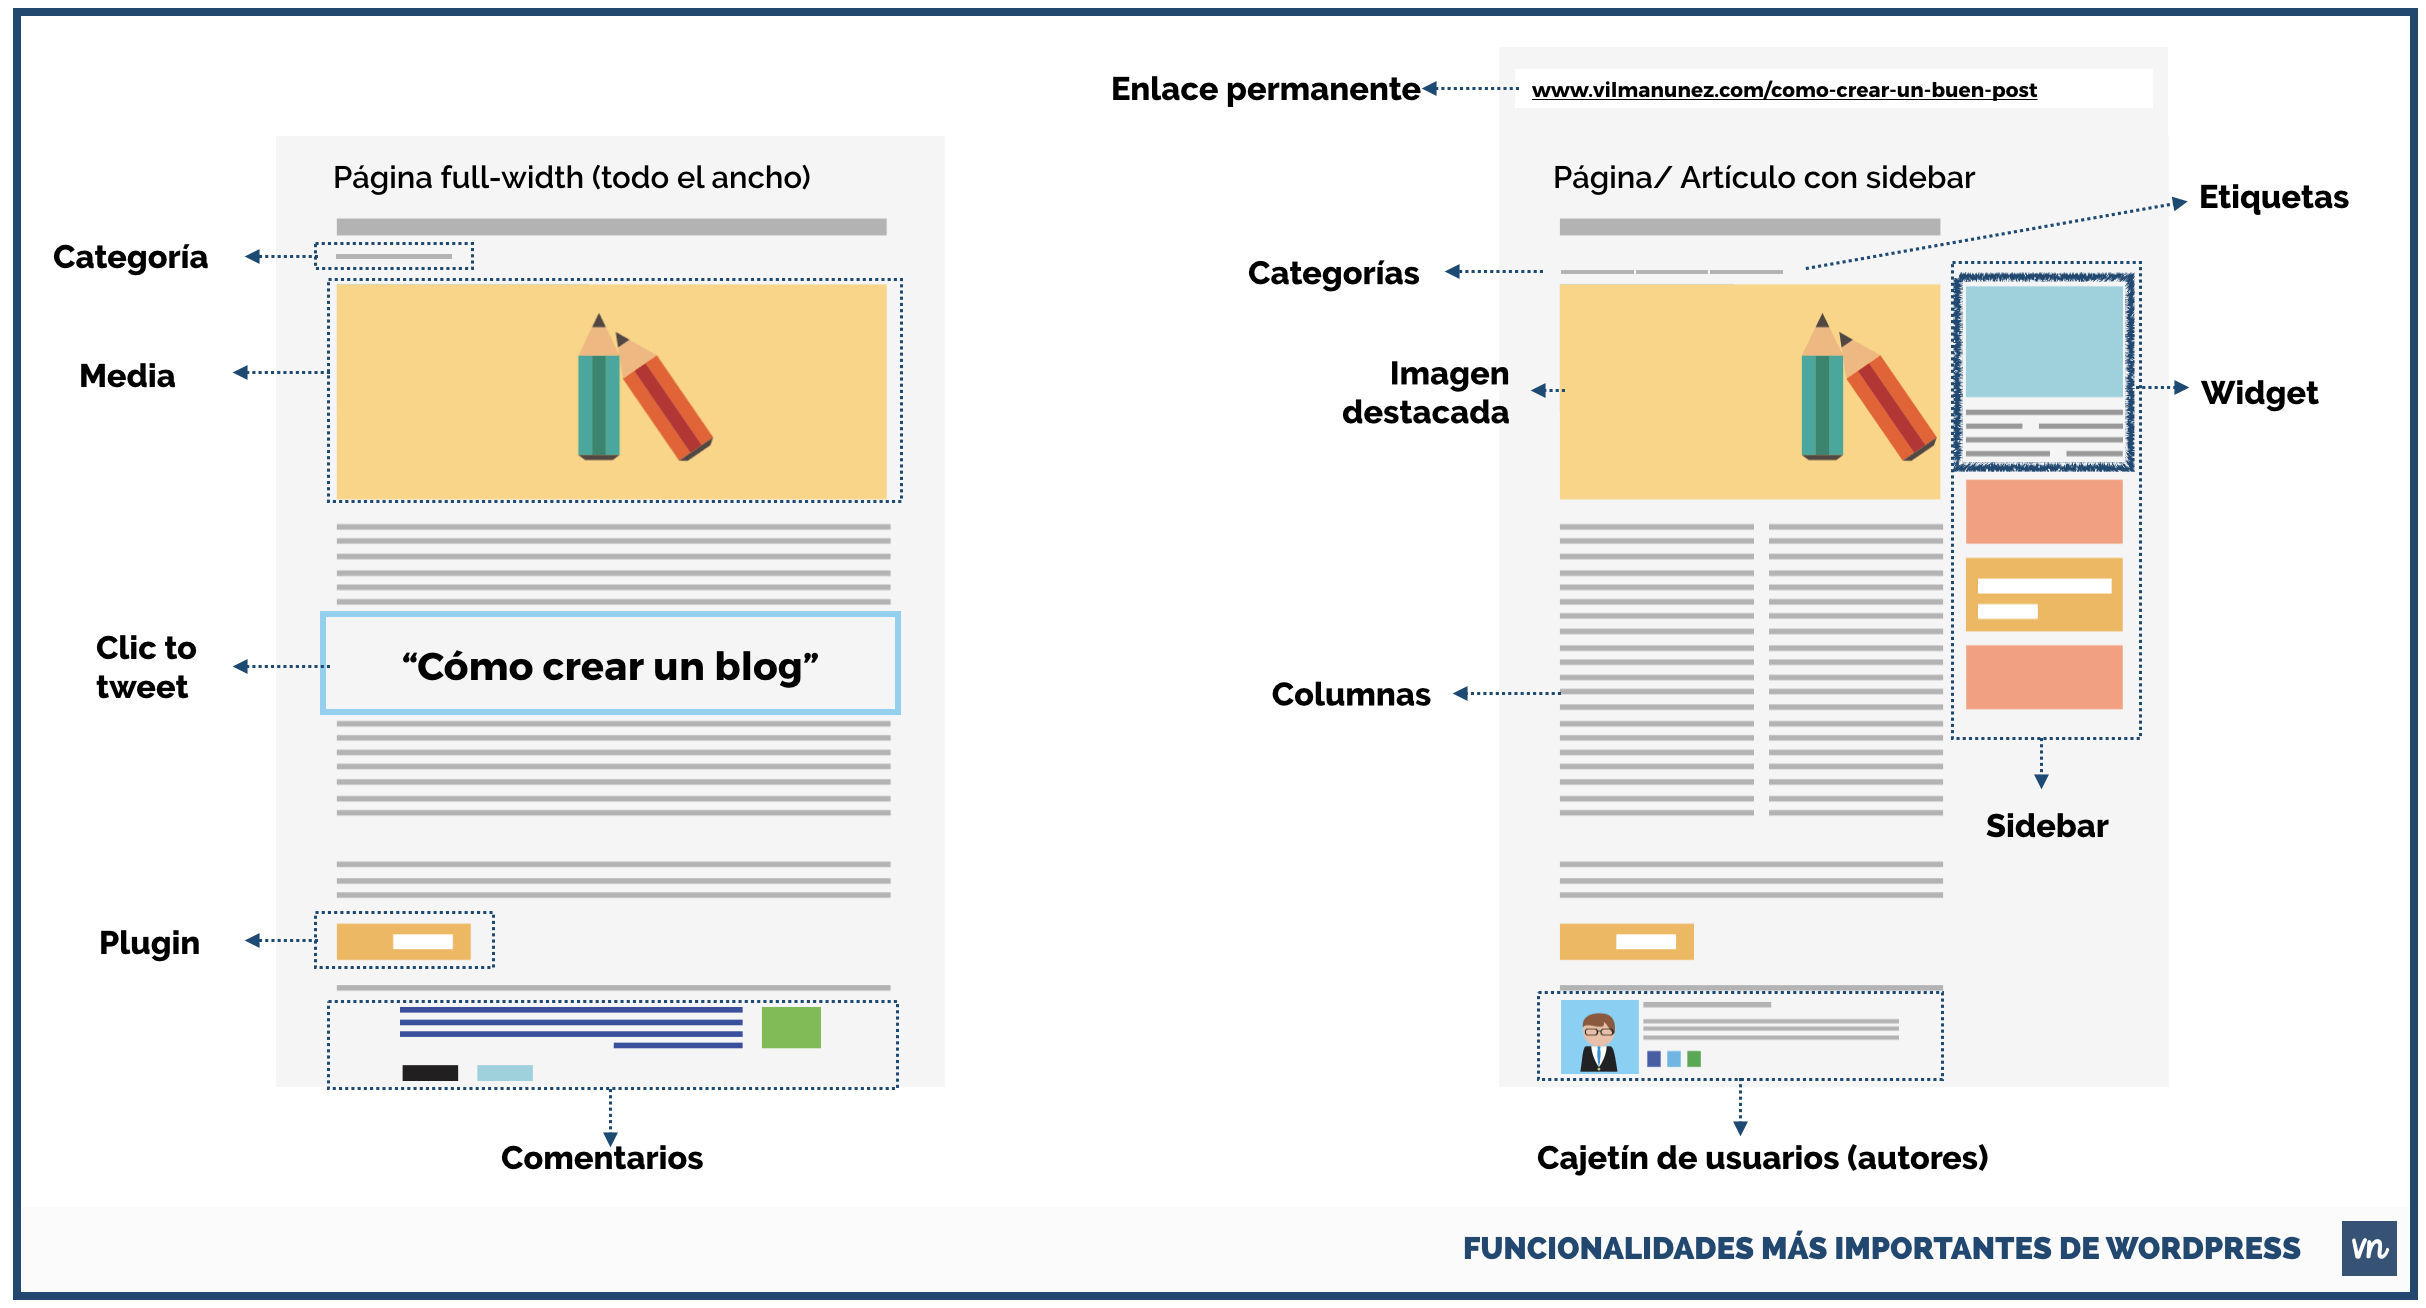 funcionalidades-mas-importantes-de-wordpress